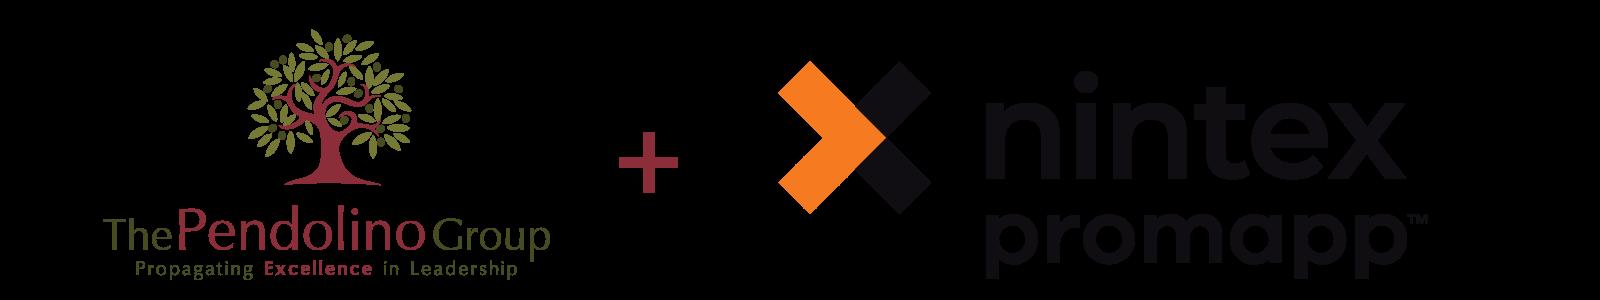 Pendolino Group and Nintex Promapp